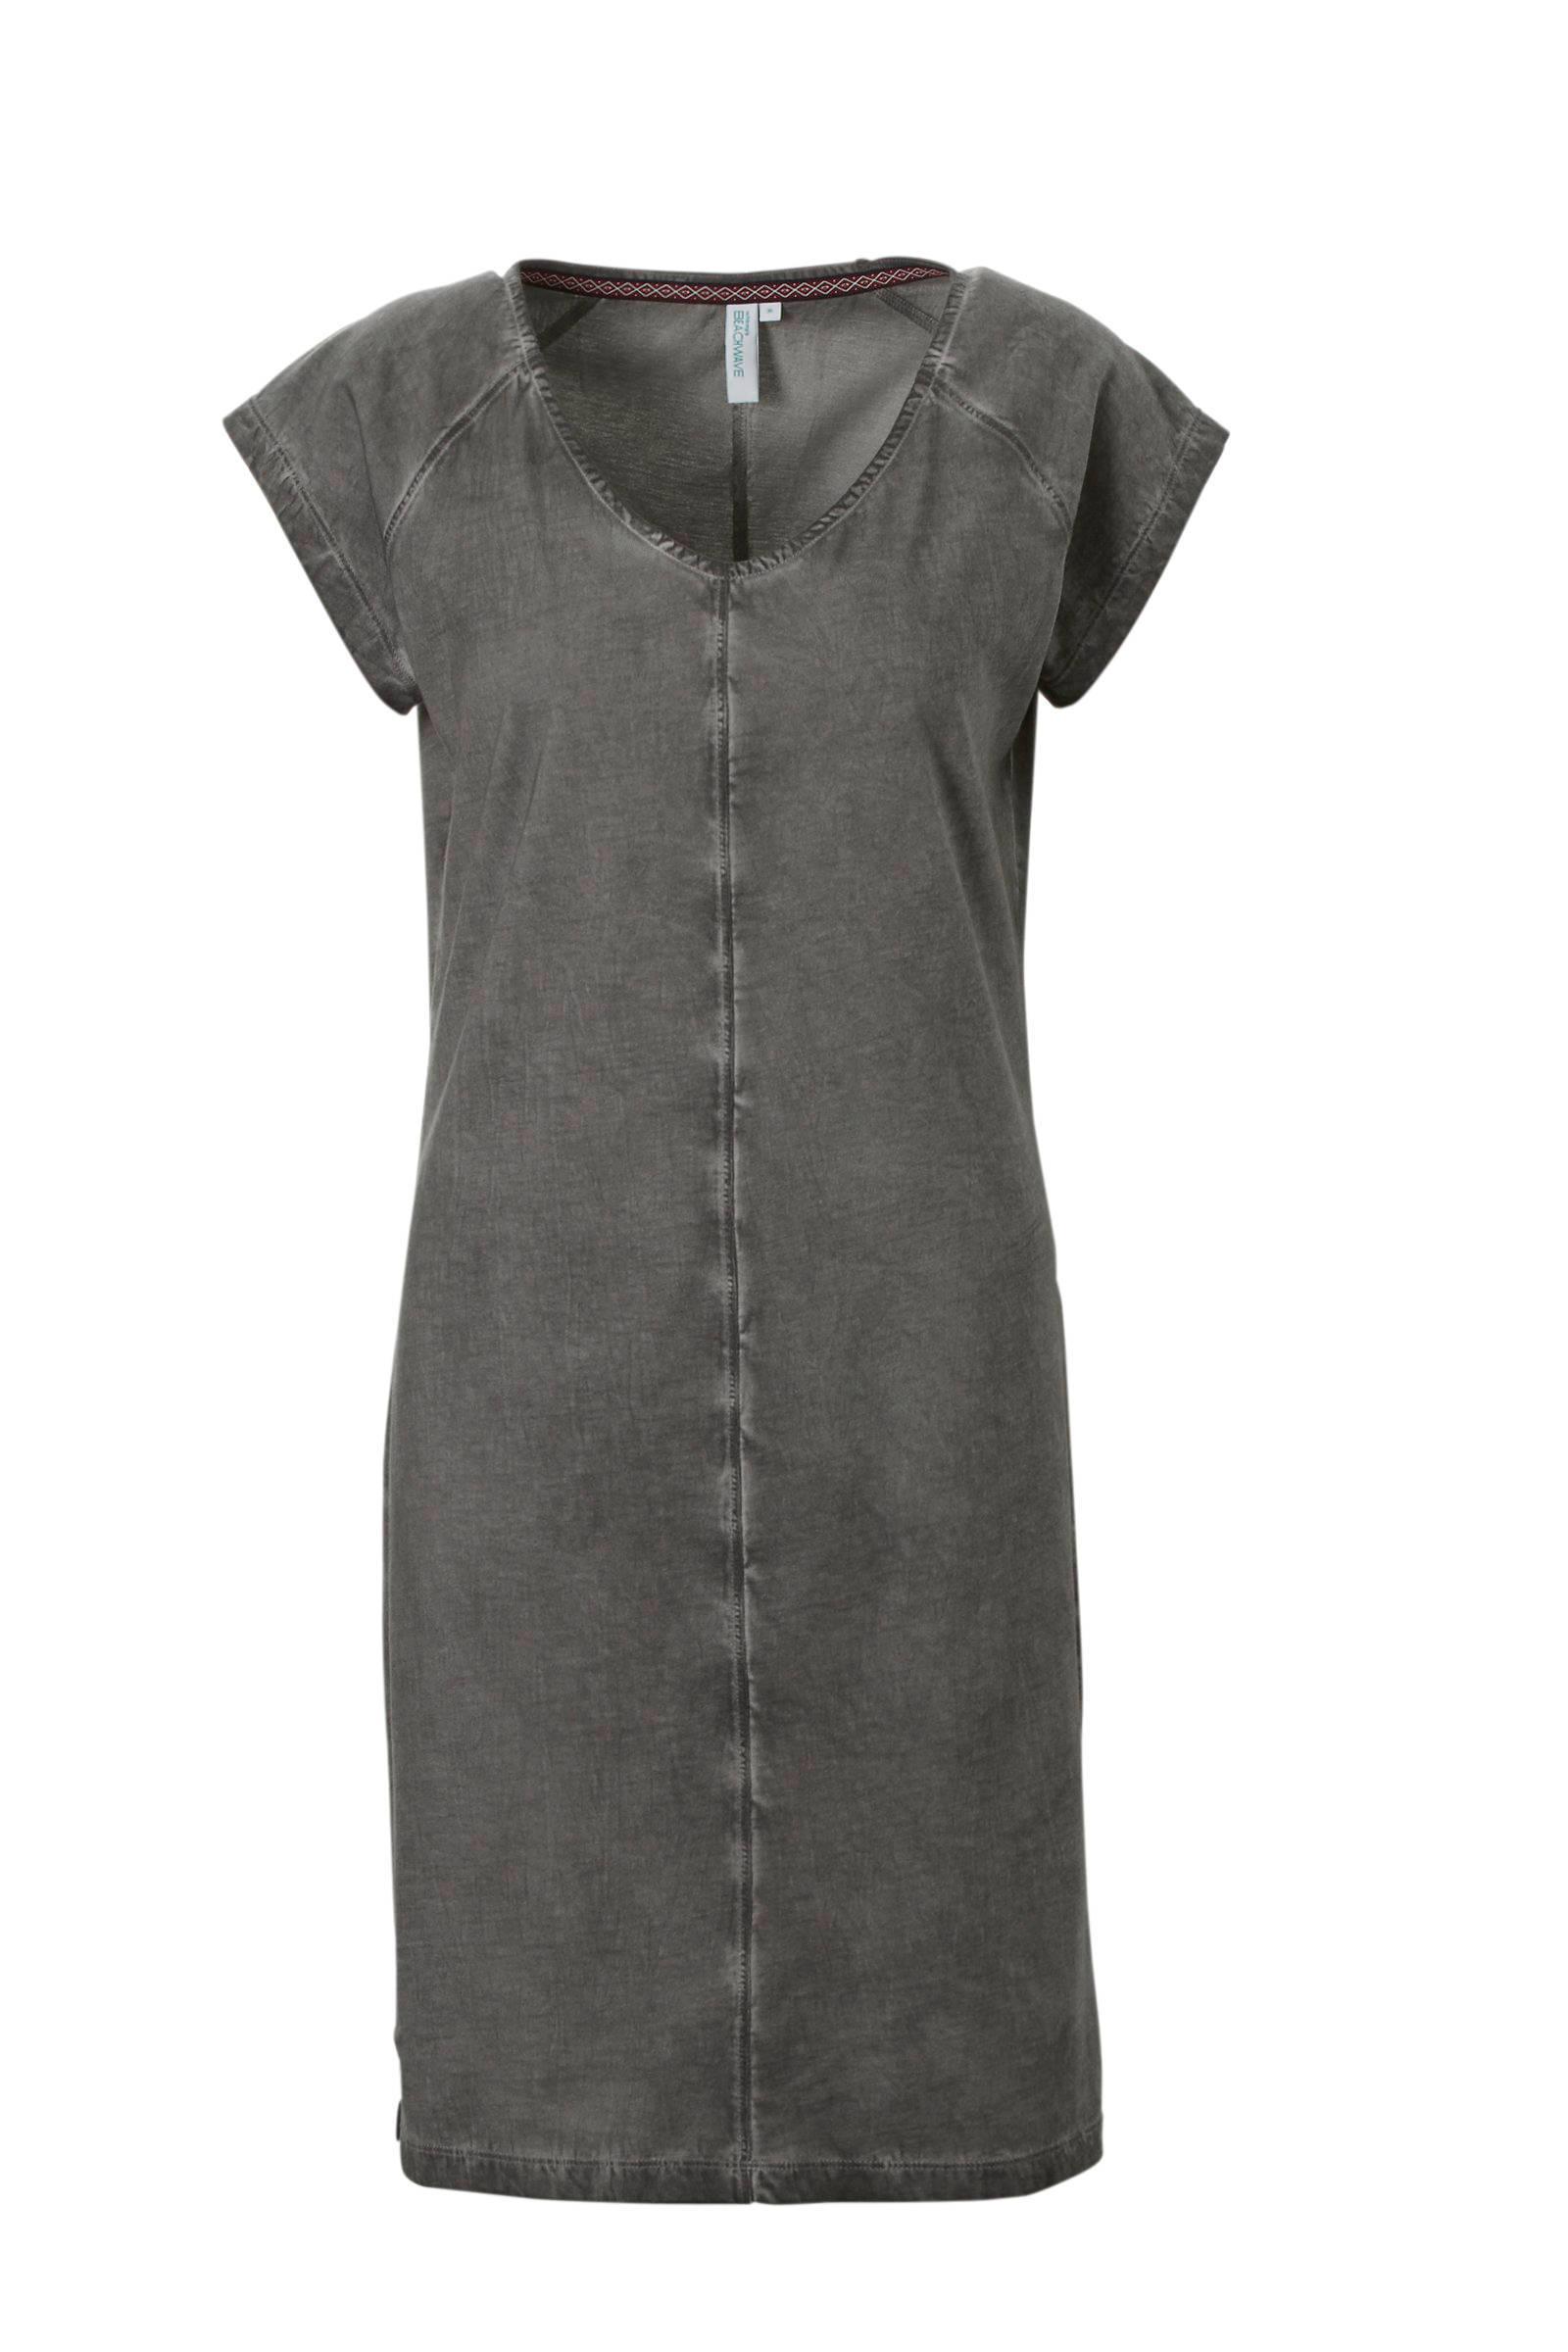 navy kleur jurk